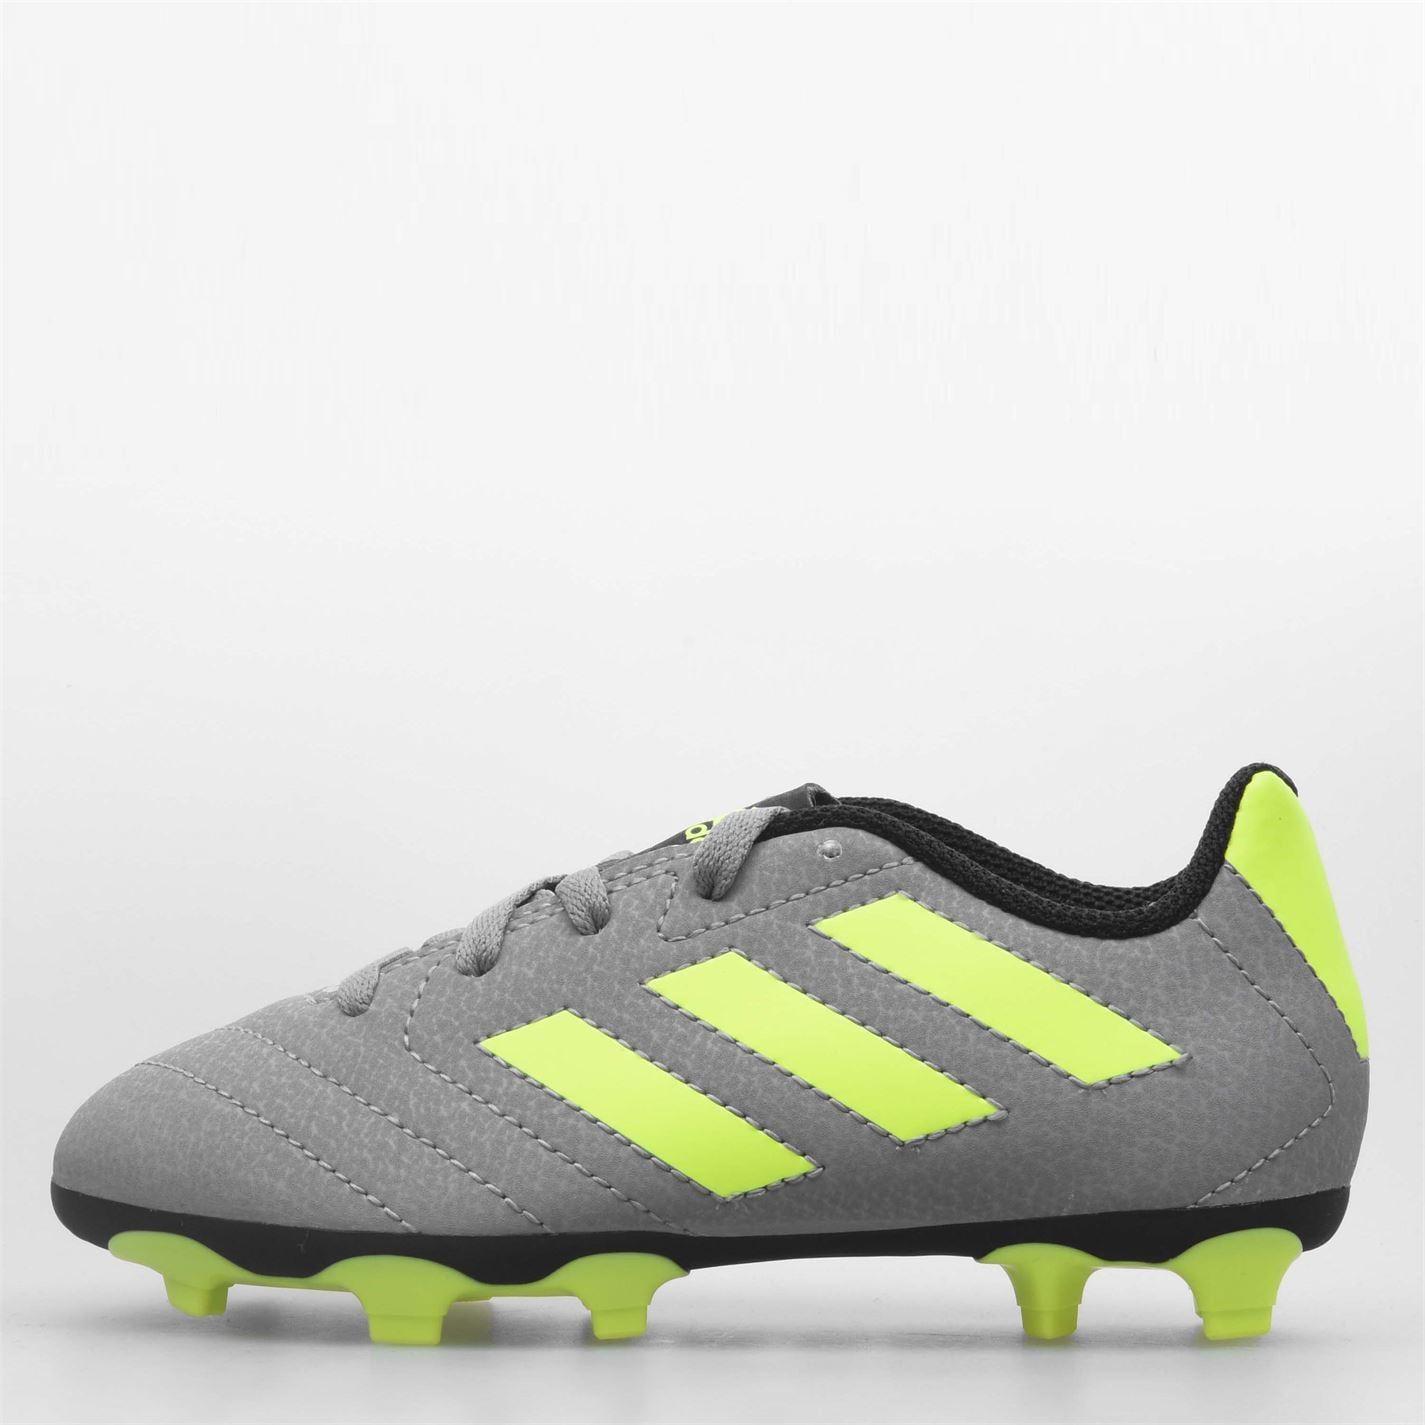 adidas Goletto FG Firm Ground Football